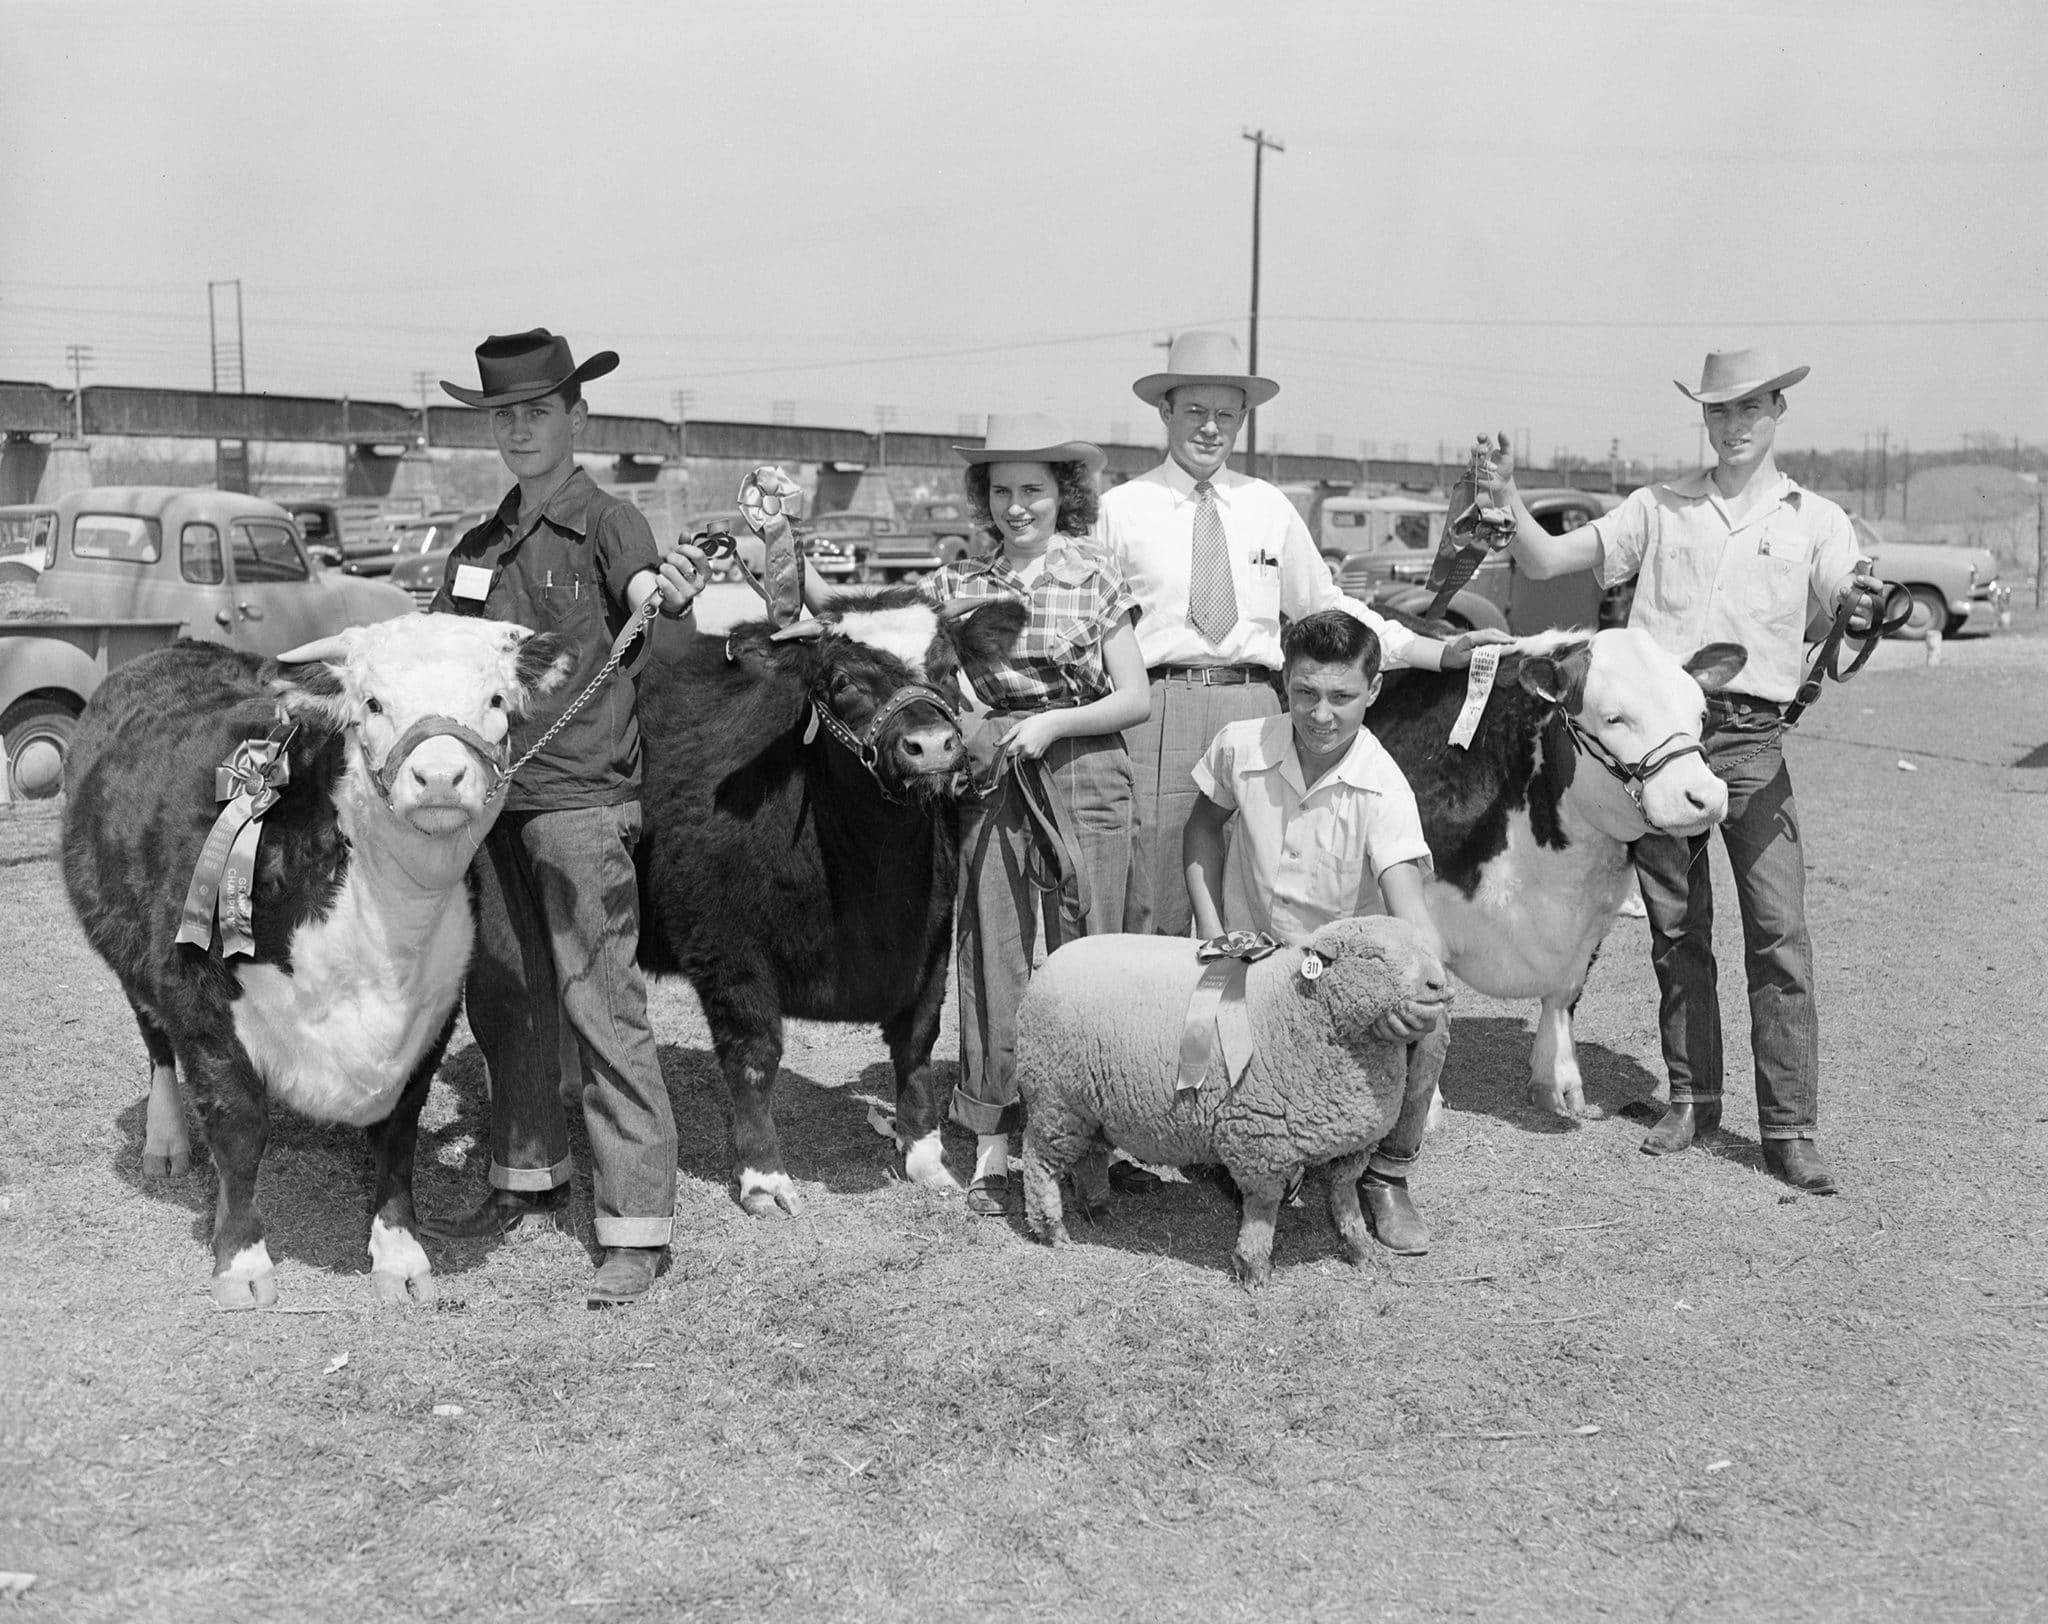 Rodeo Austin history photo